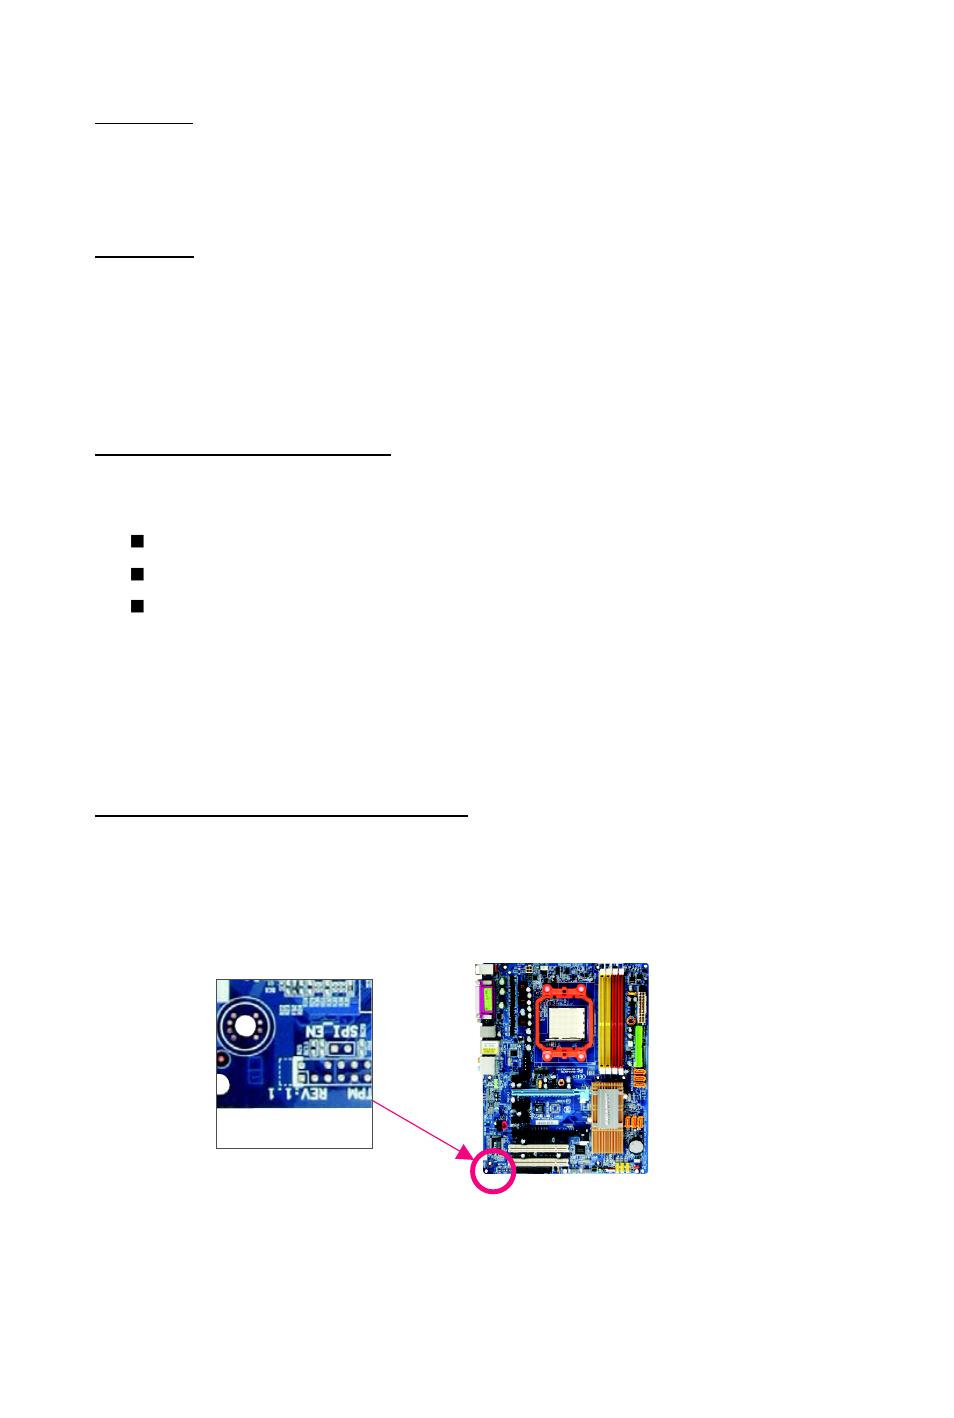 gigabyte ga ma790xt ud4p user manual page 3 112 original mode rh manualsdir com Corvette Owners Manual Operators Manual